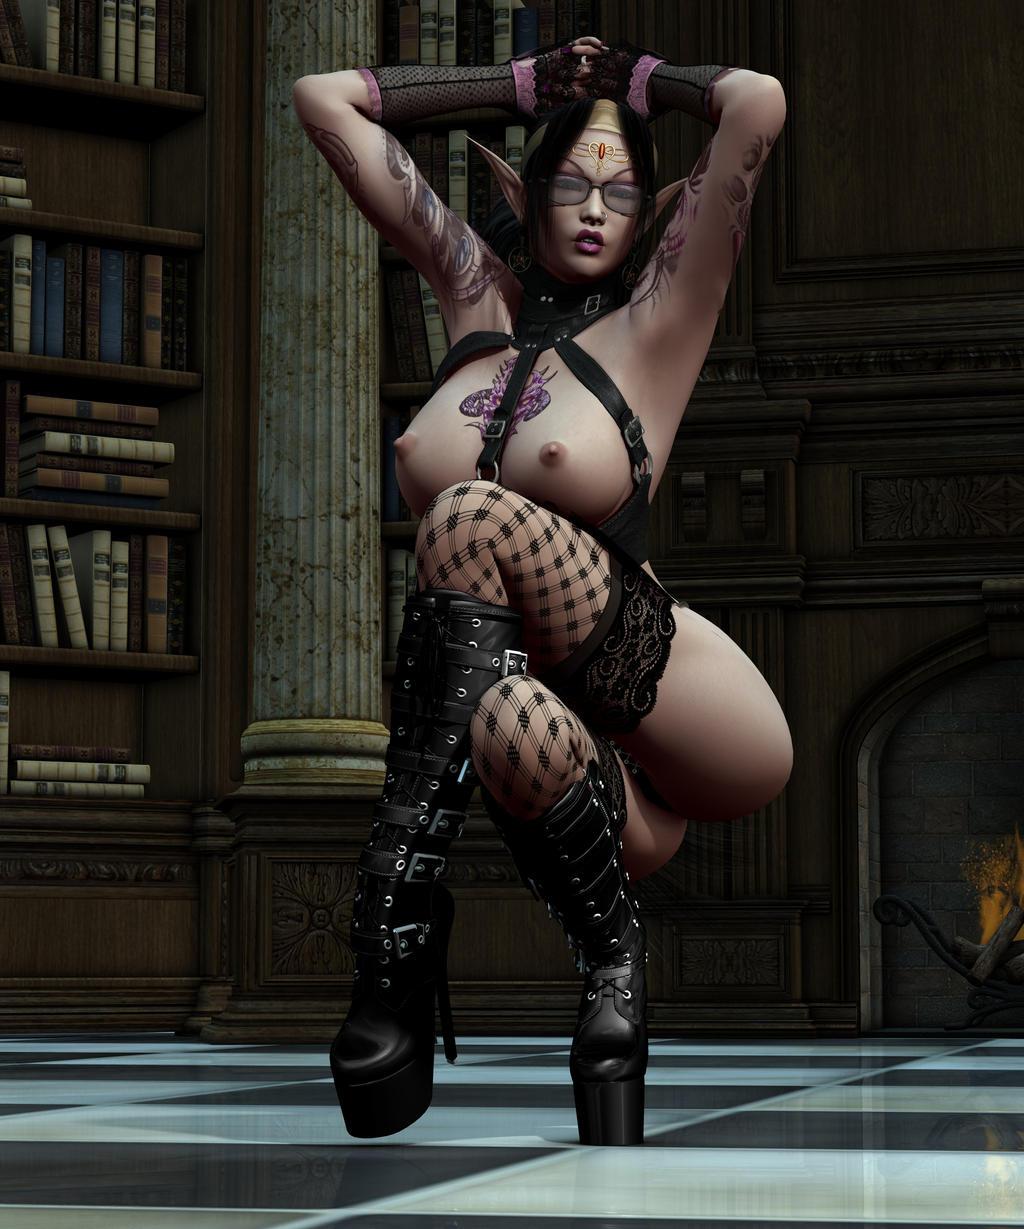 Fantasy sexy 3-dimensional art erotic photos